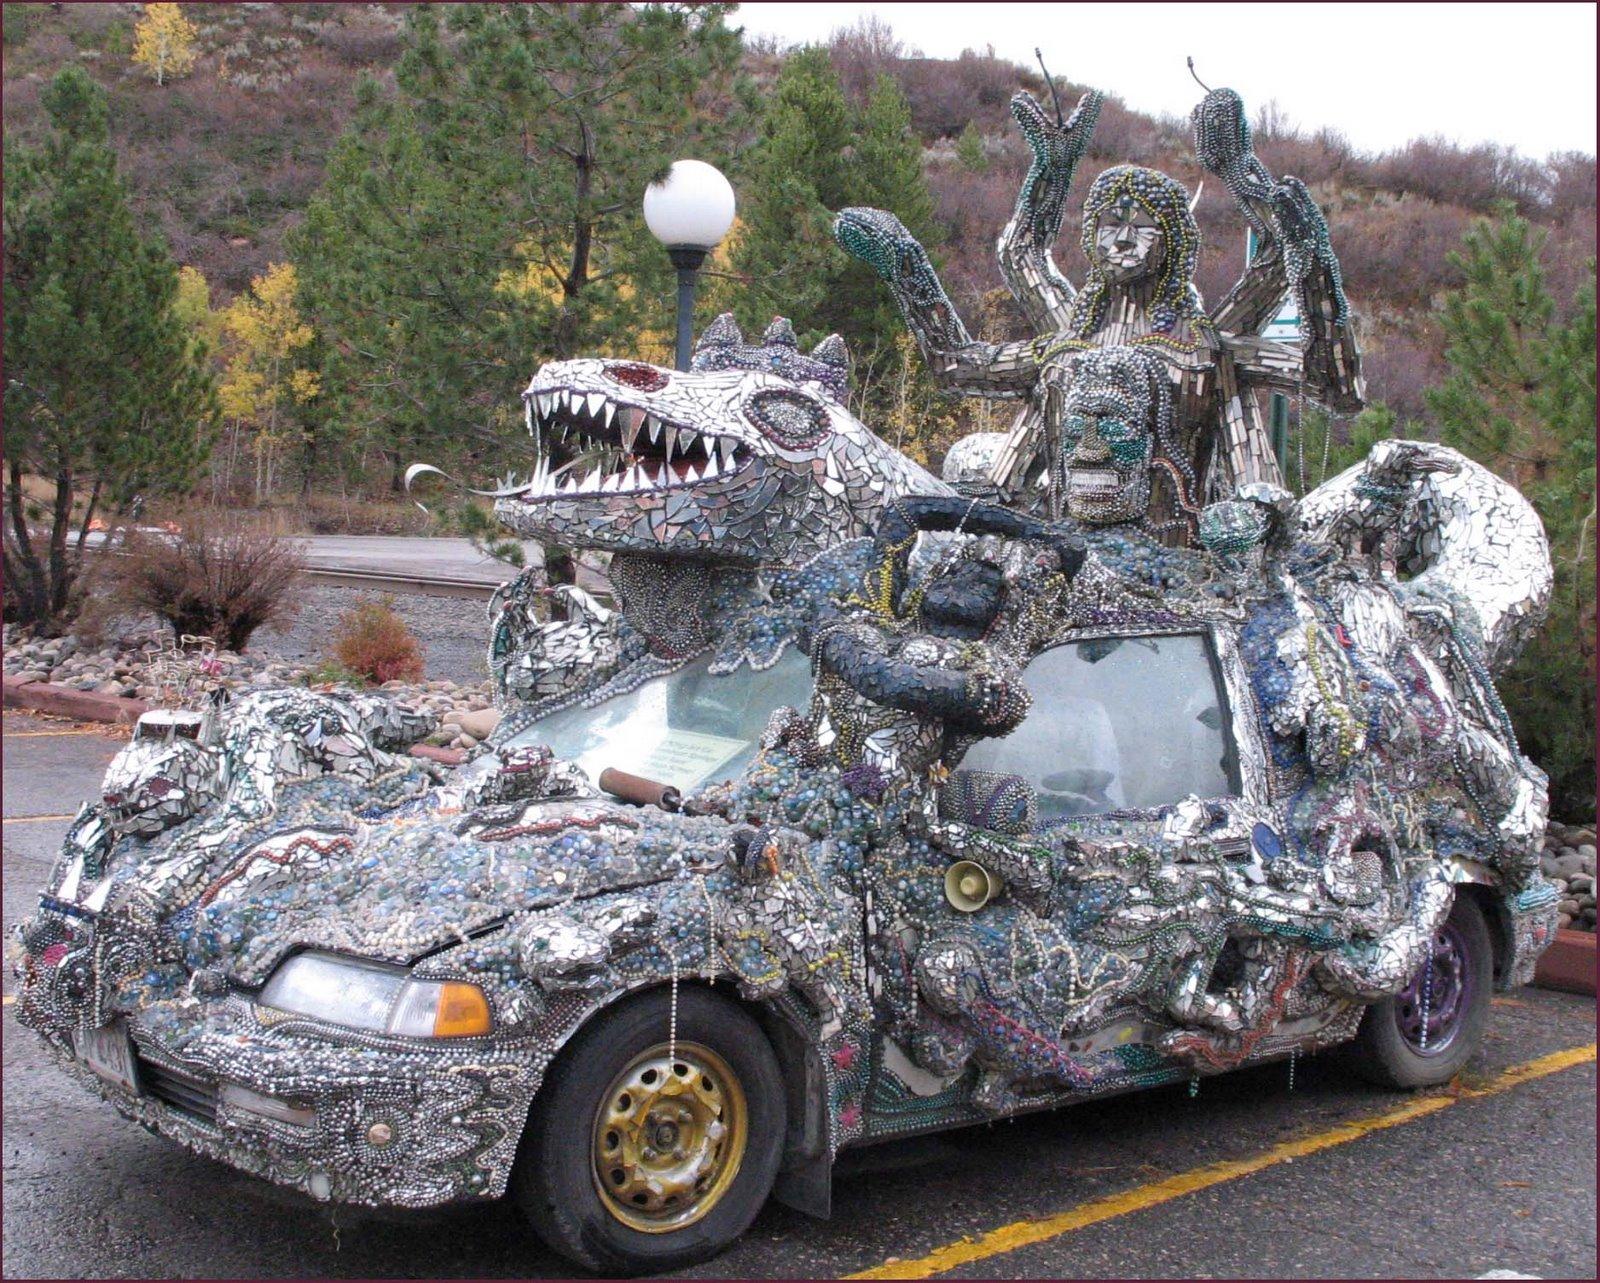 Crazy hondas the model the lizard king car